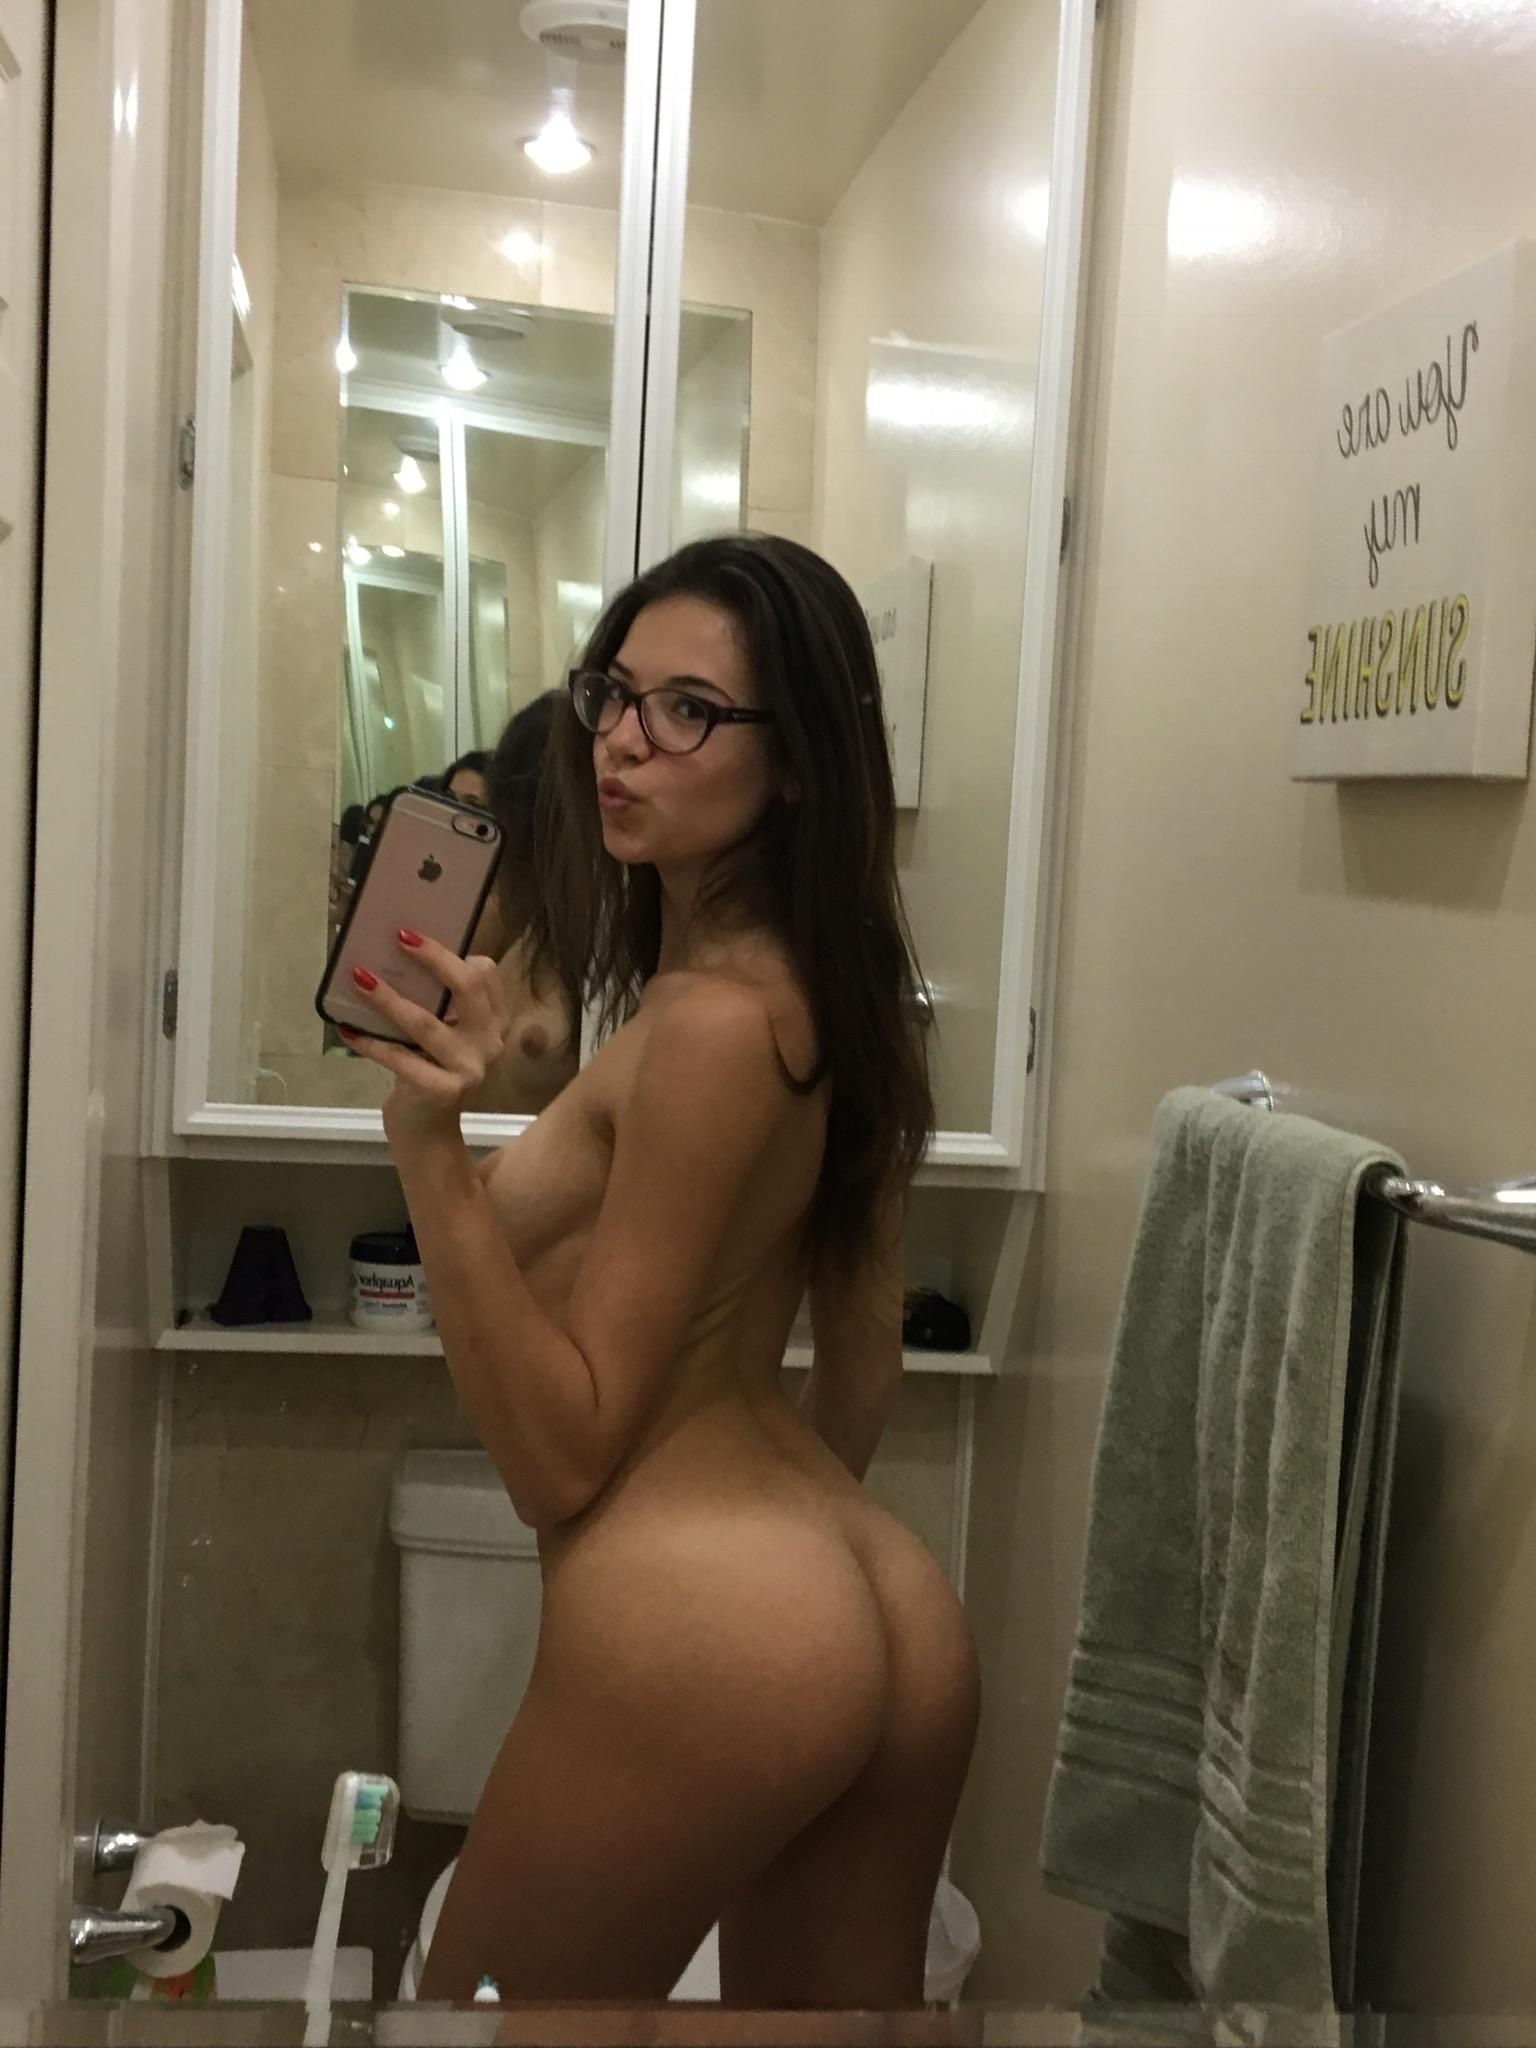 college-girl-sexy-mirror-pics-xxx-teen